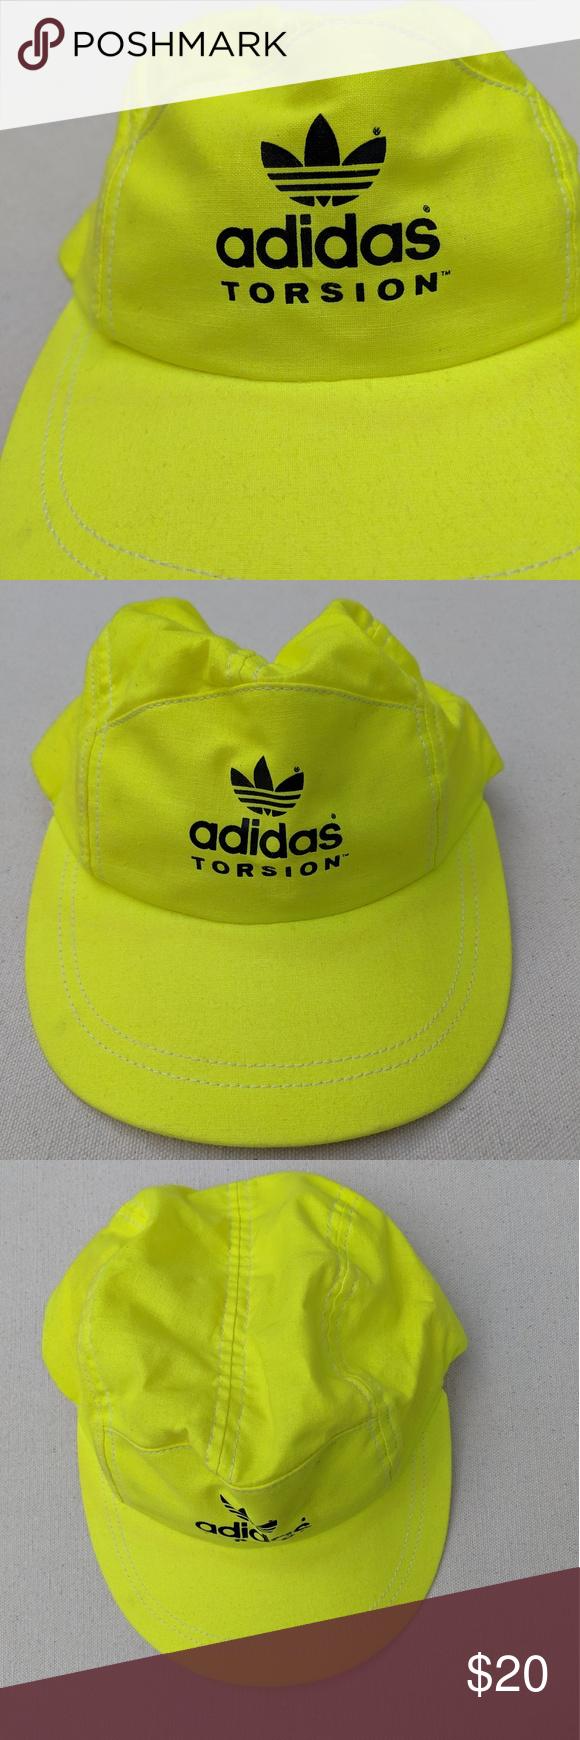 Vintage Adidas Torsion Hat Bright Yellow Vintage Adidas Torsion Hat In Bright Yellow Shows Some Light Staining At T Vintage Adidas Adidas Torsion Yellow Adidas